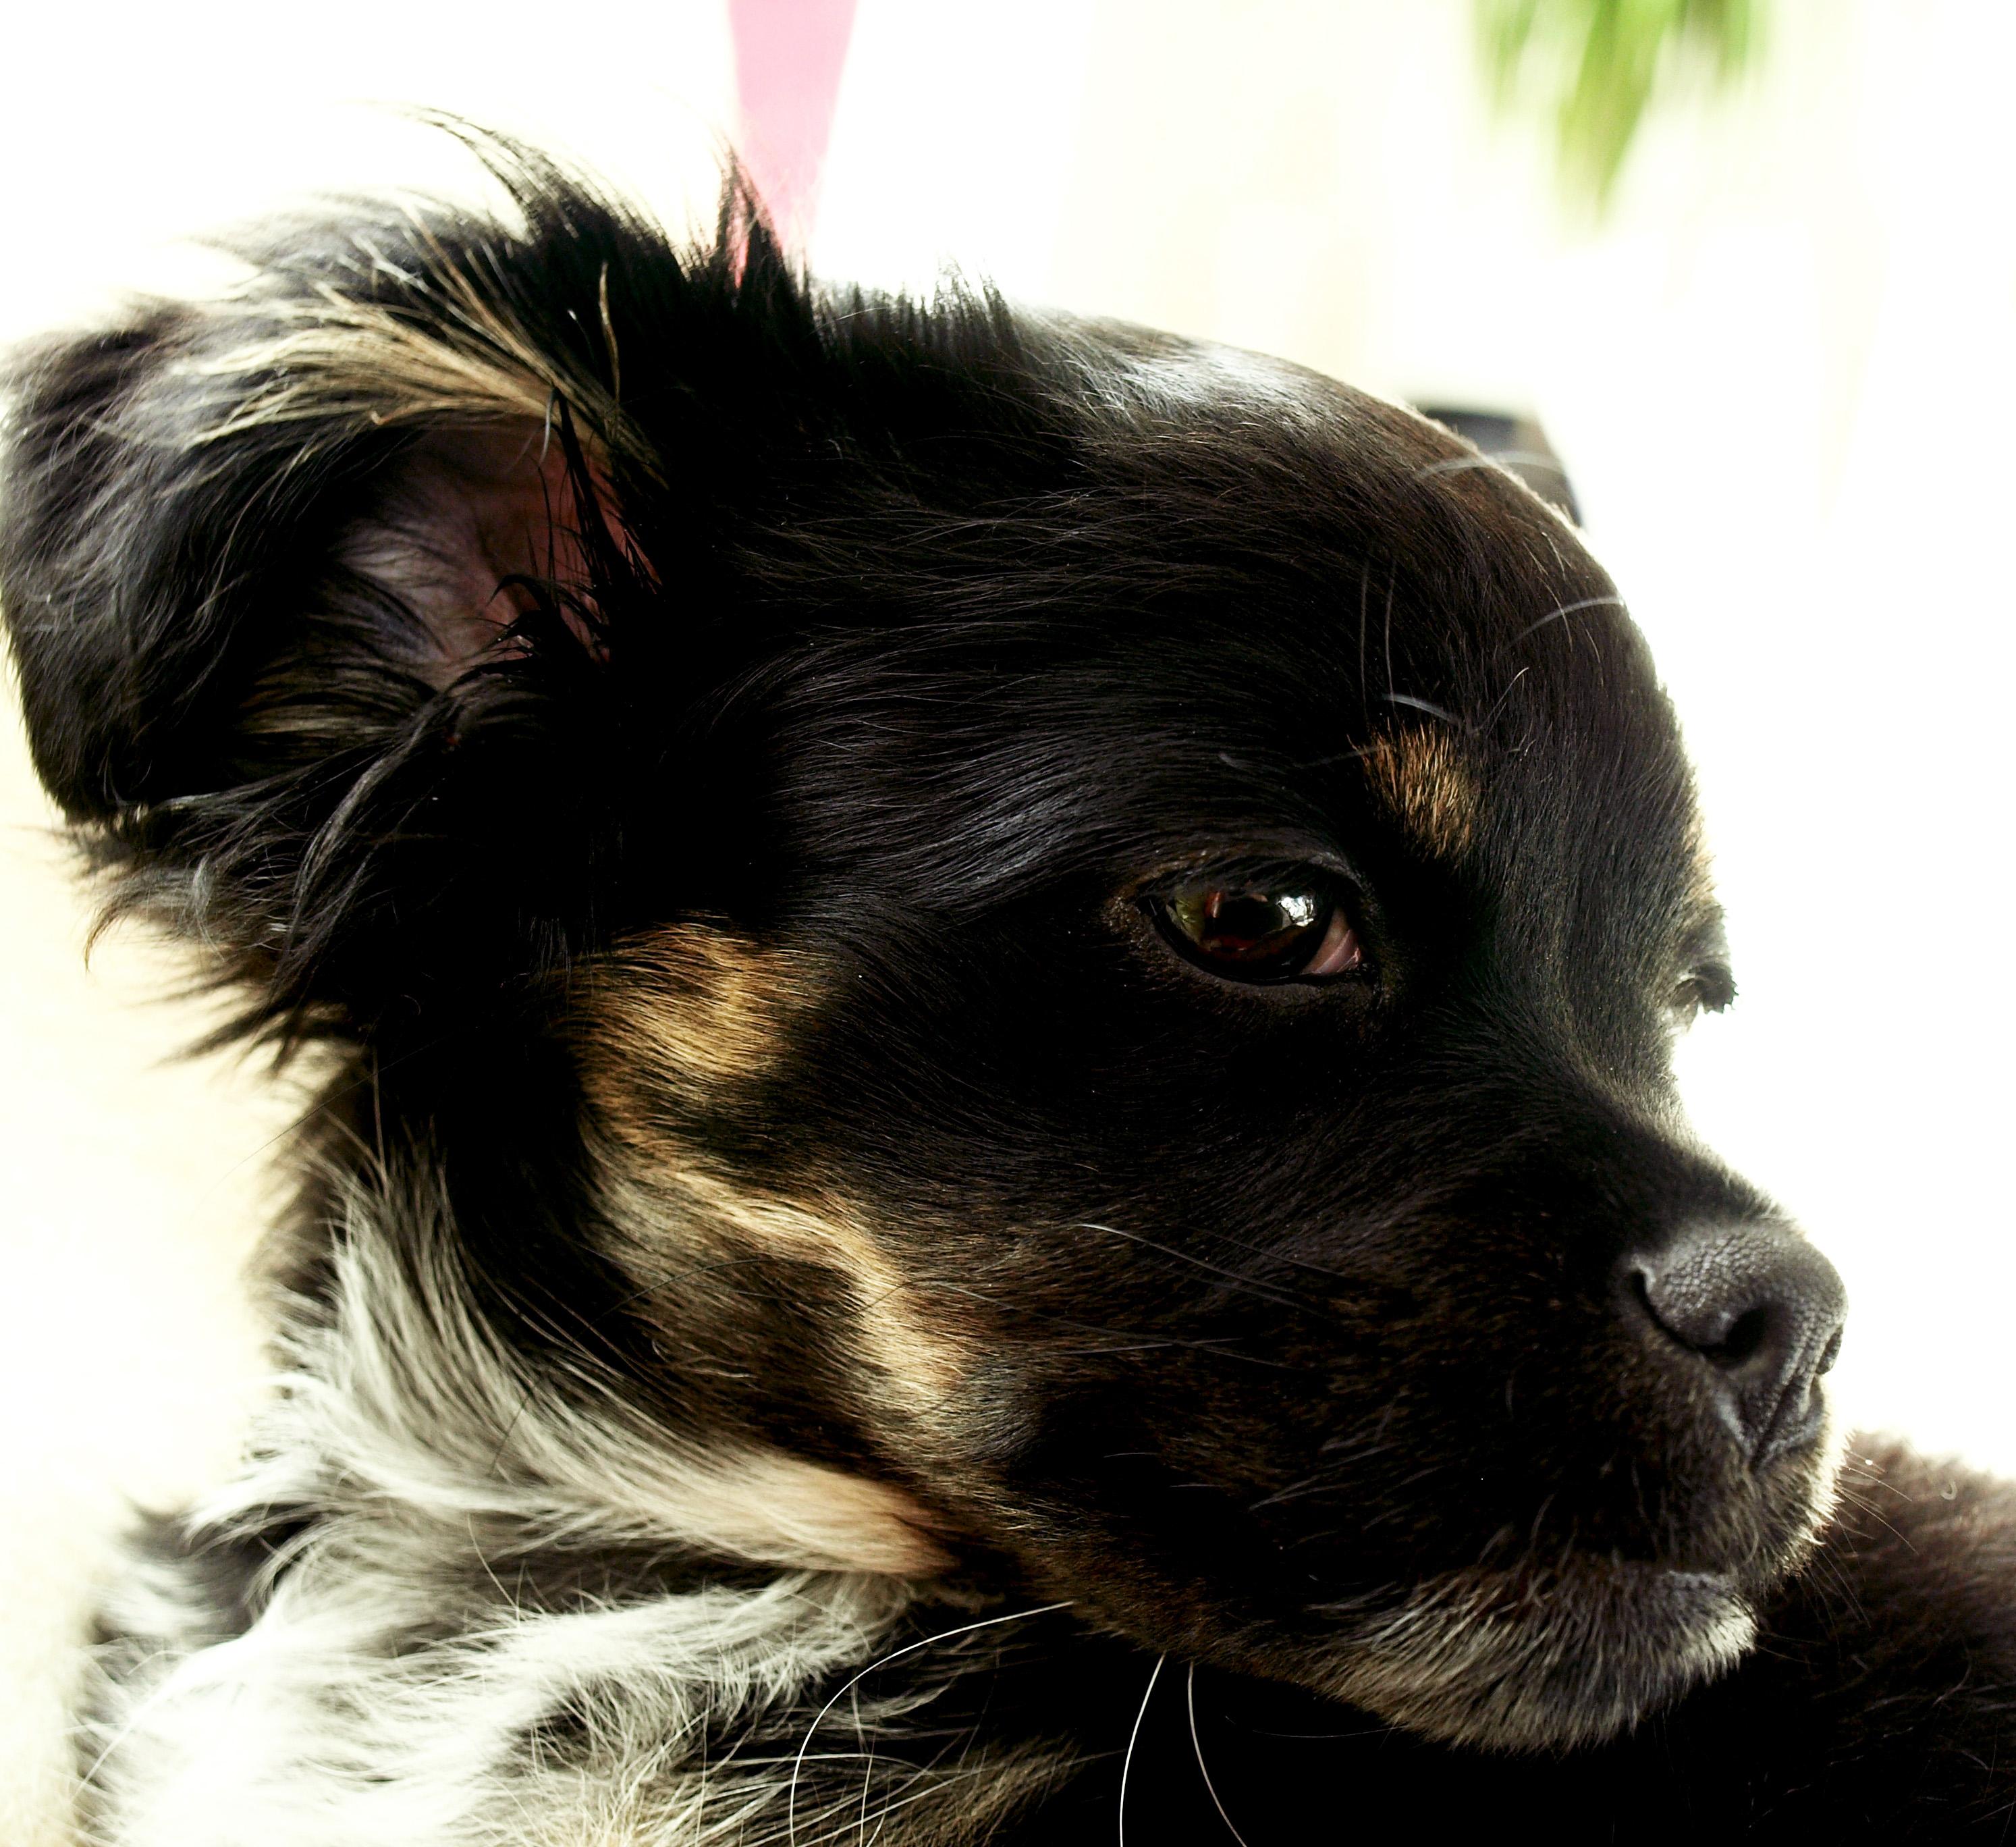 My sweet Molly. 09.04.14